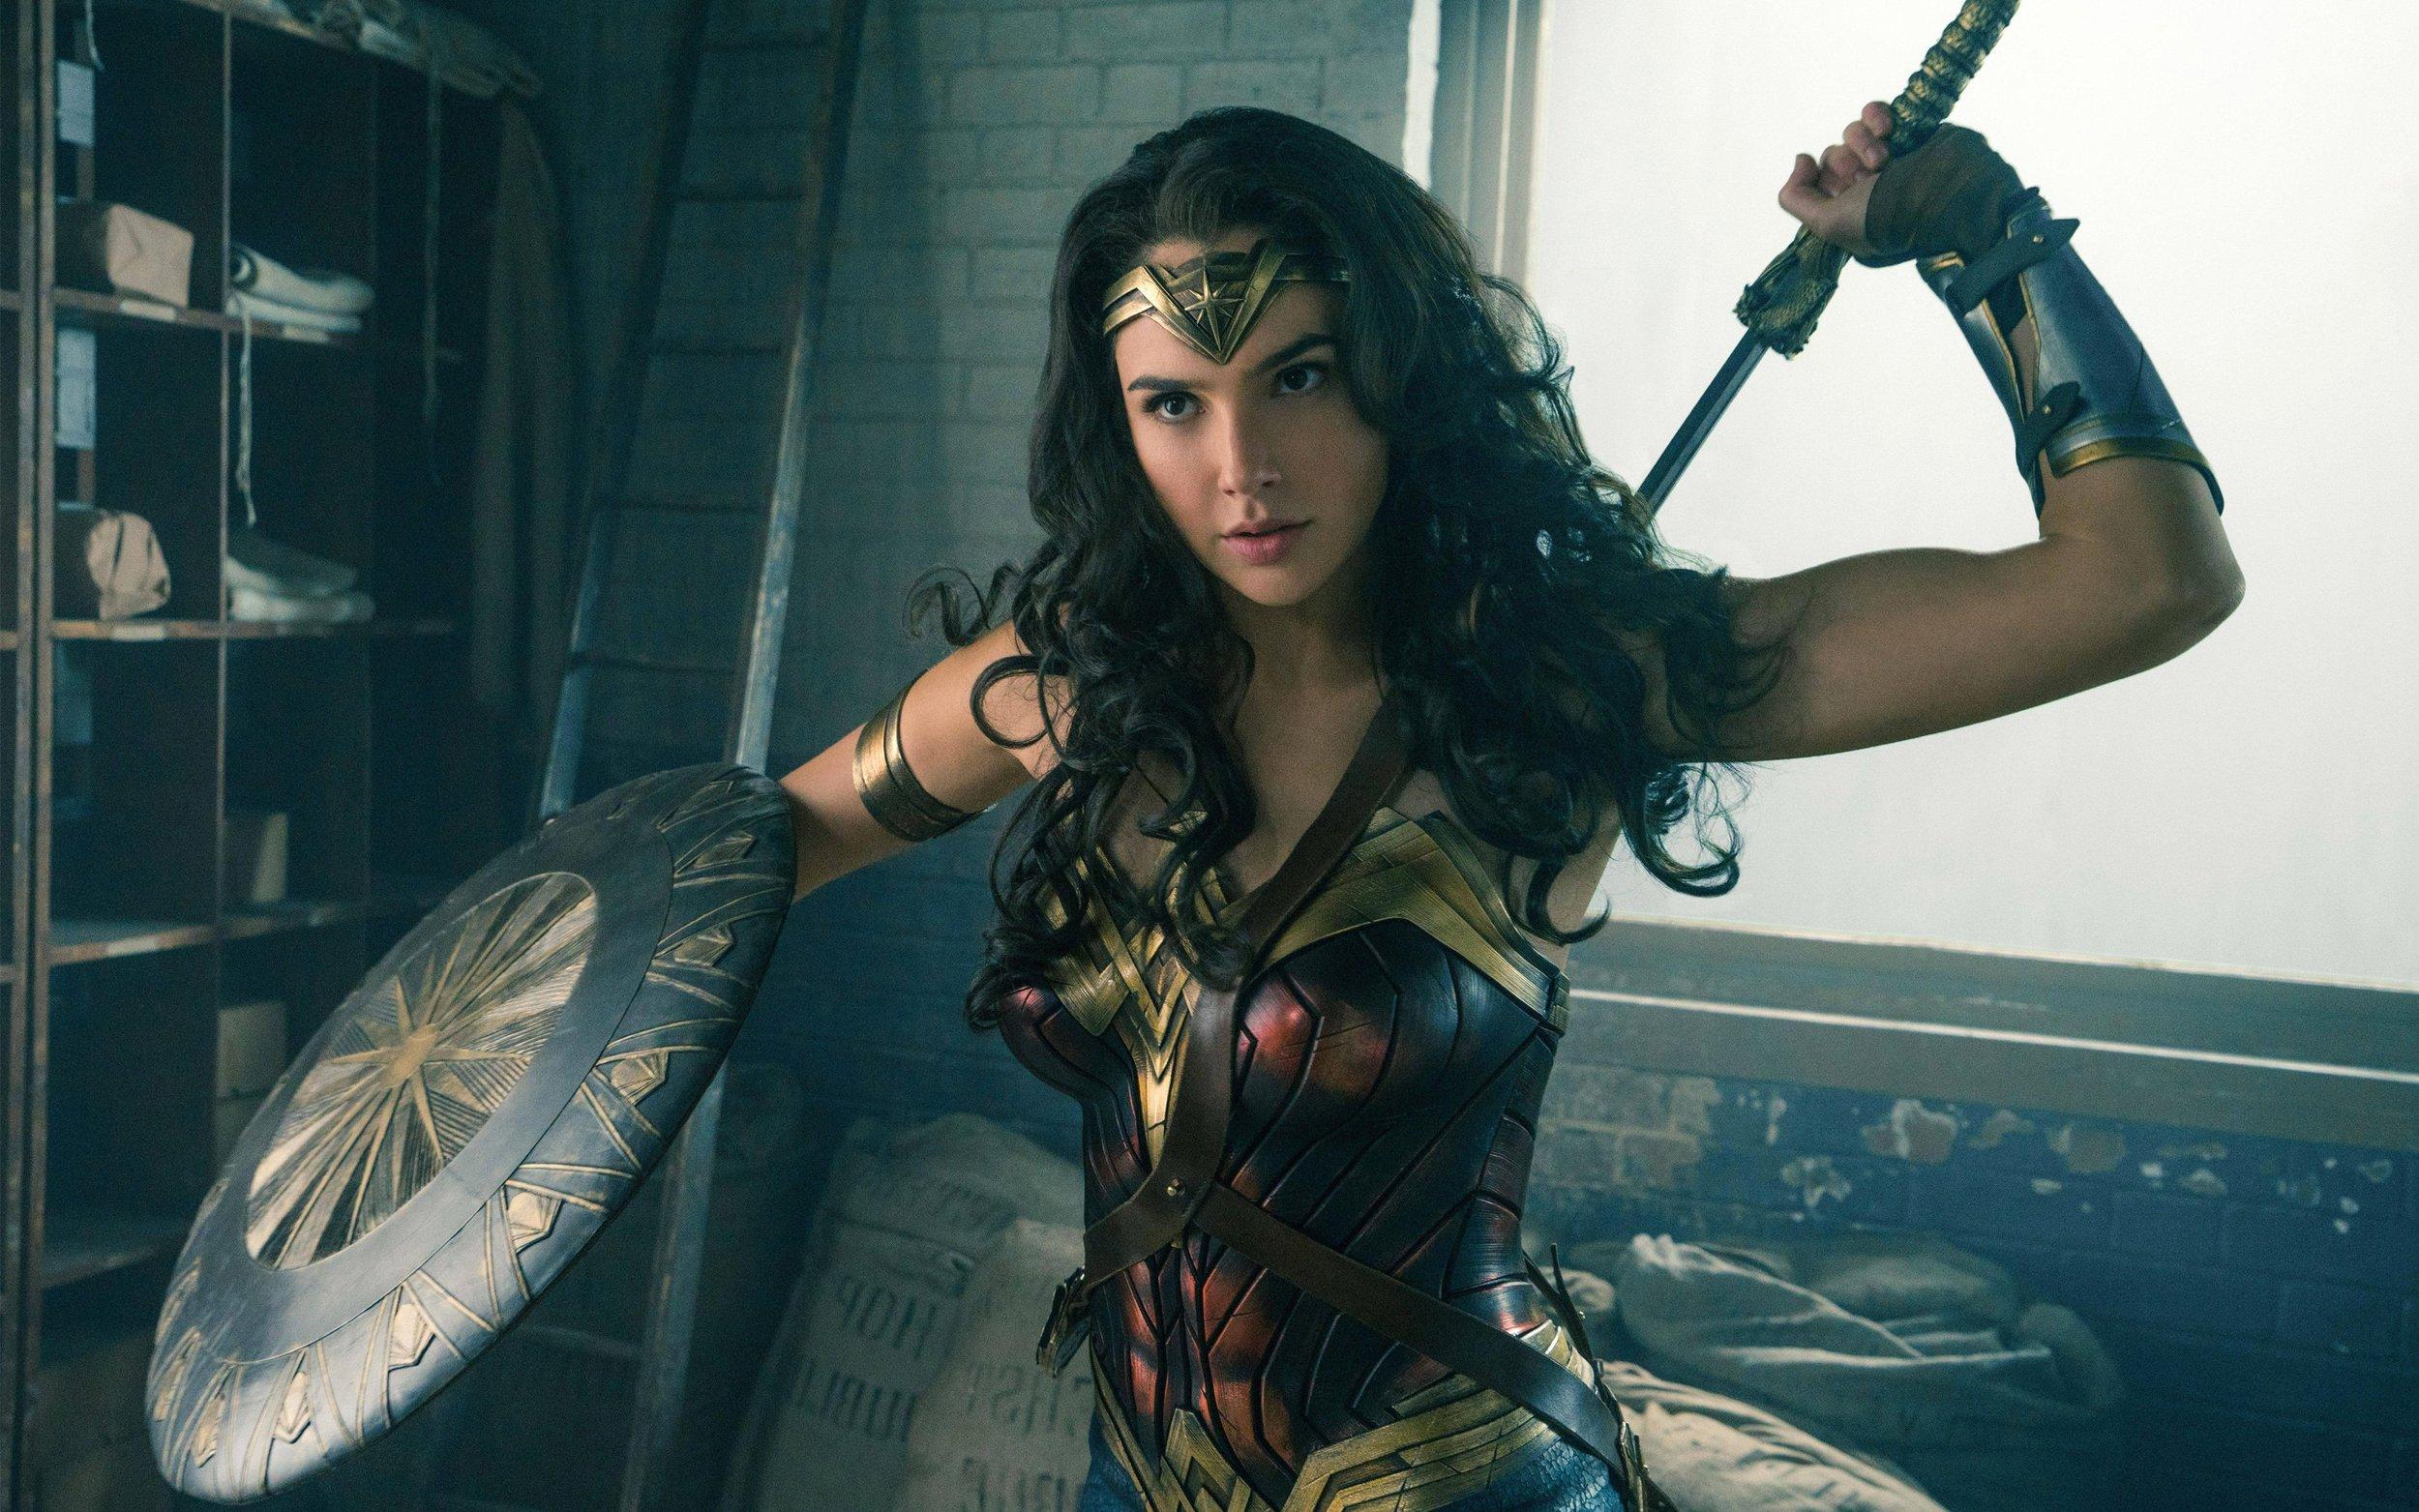 Gal Gadot in Wonder Woman. Photo: Warner Bros.